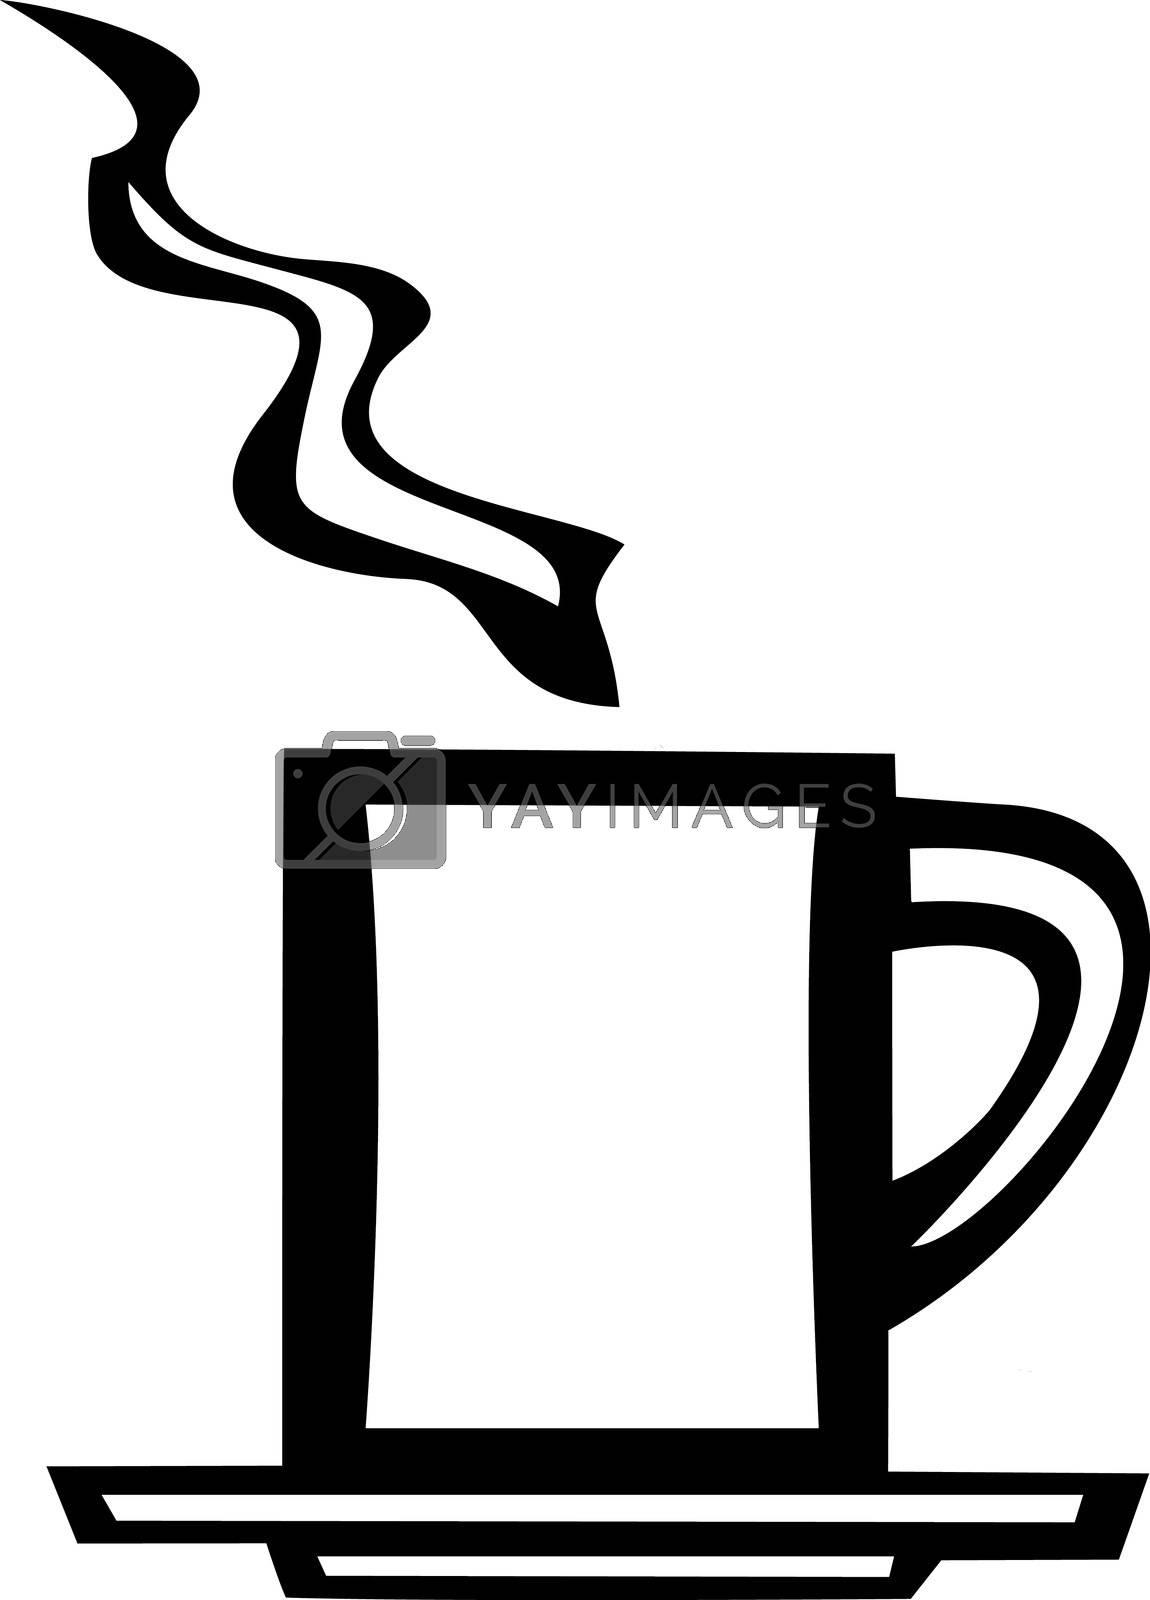 smooth white vector image of a coffee mug.